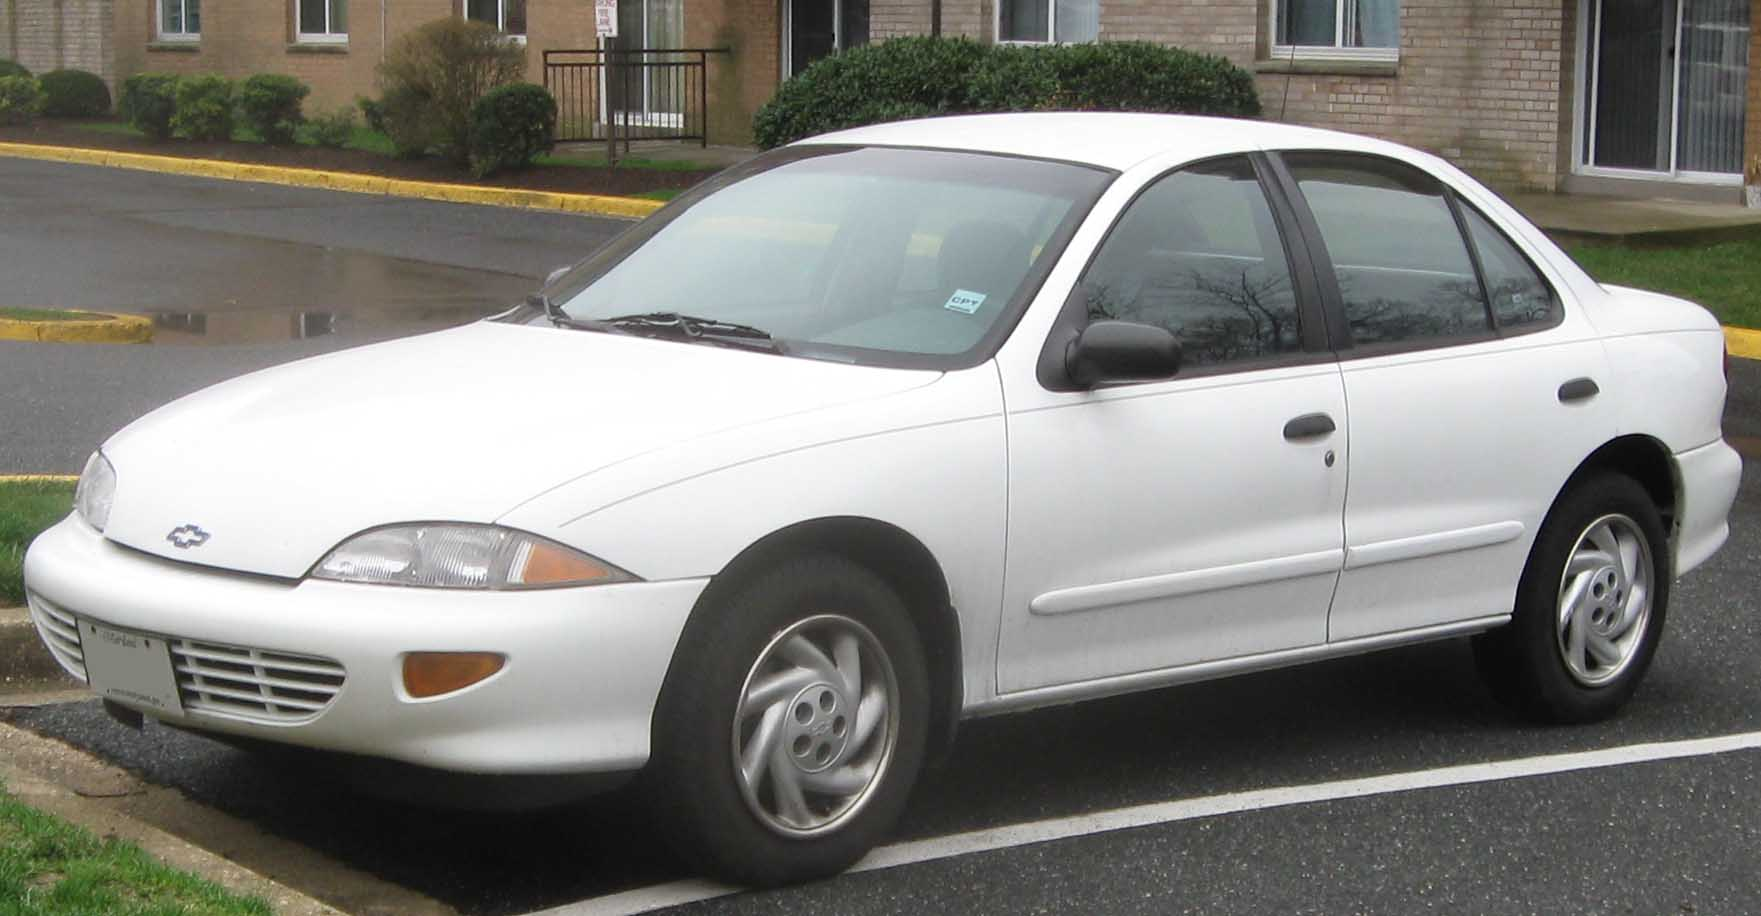 Chevrolet Cavalier 2006 foto - 2